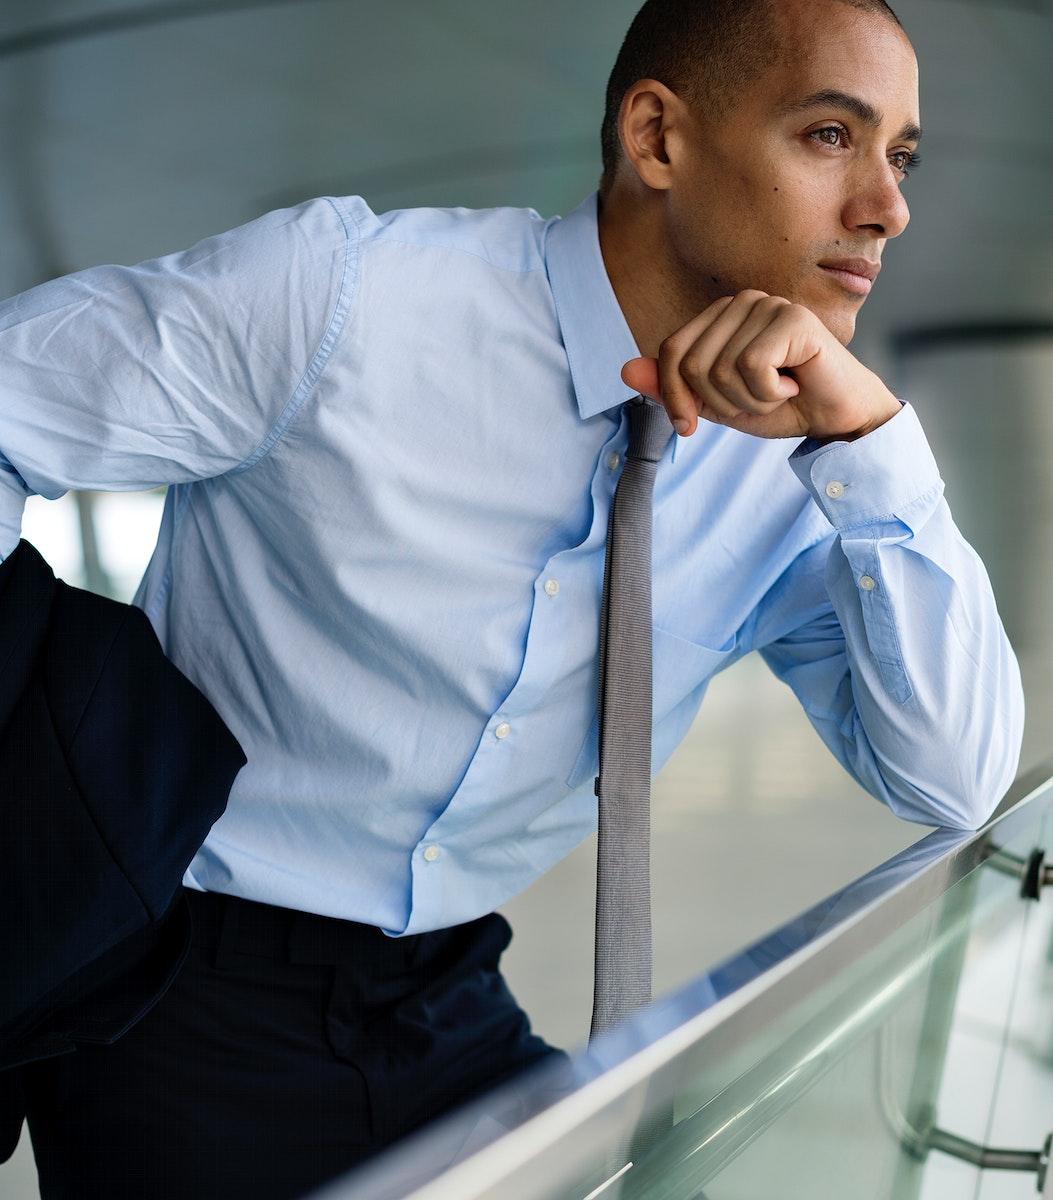 Smart-looking businessman posing